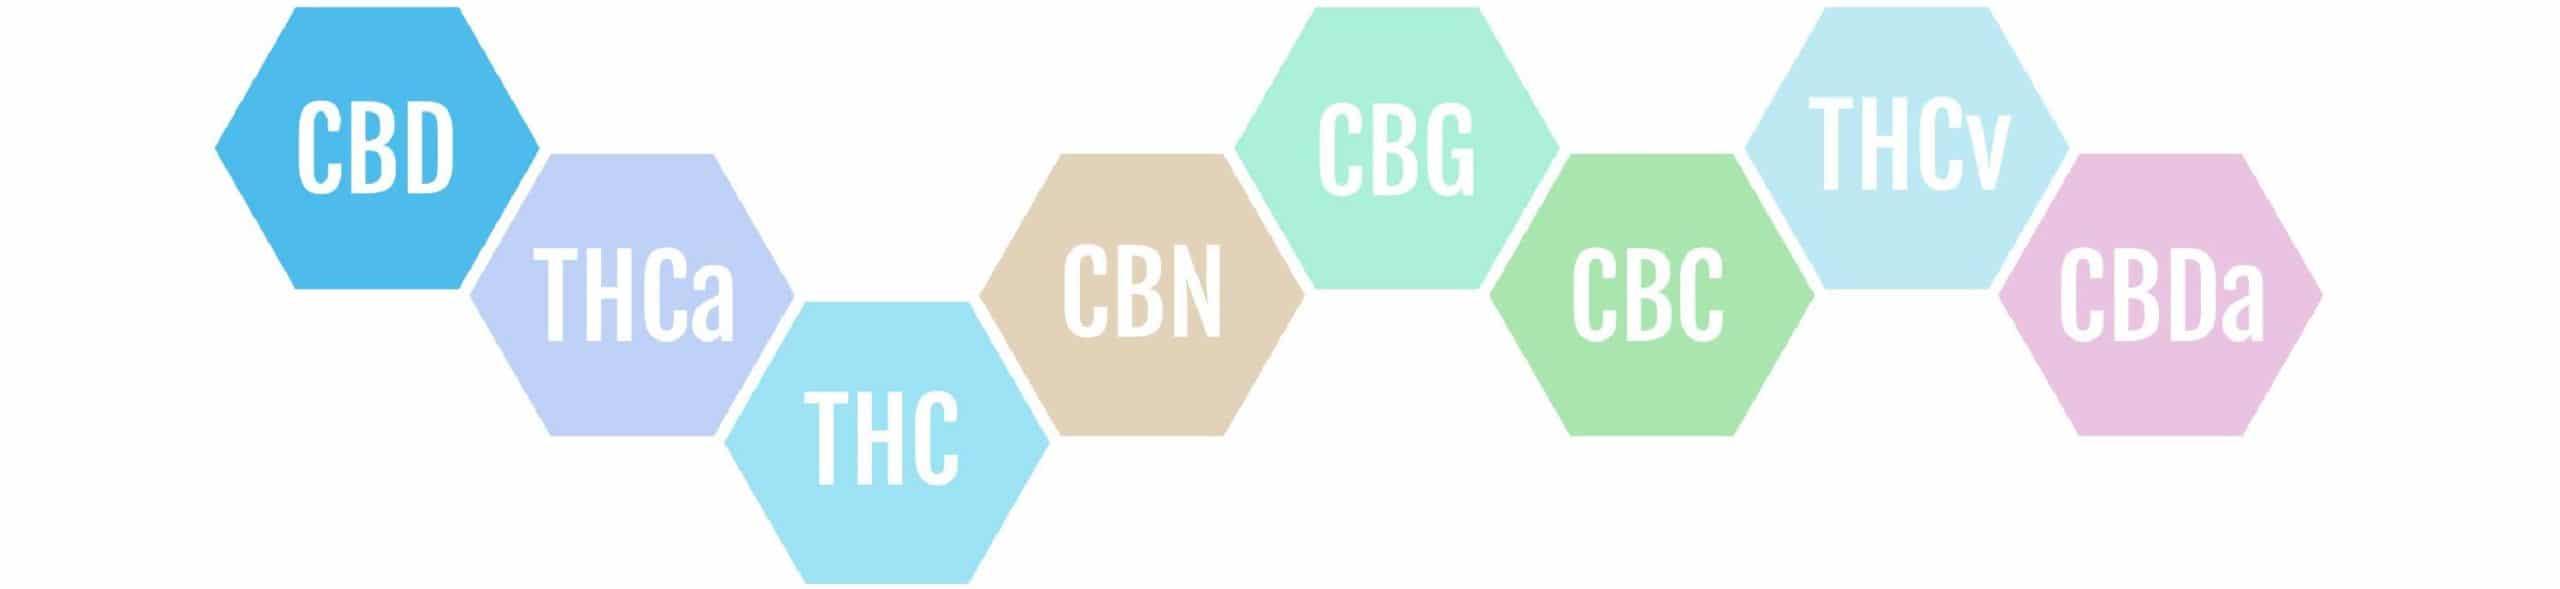 cbDNA CBD Canabidiol THC 01 scaled